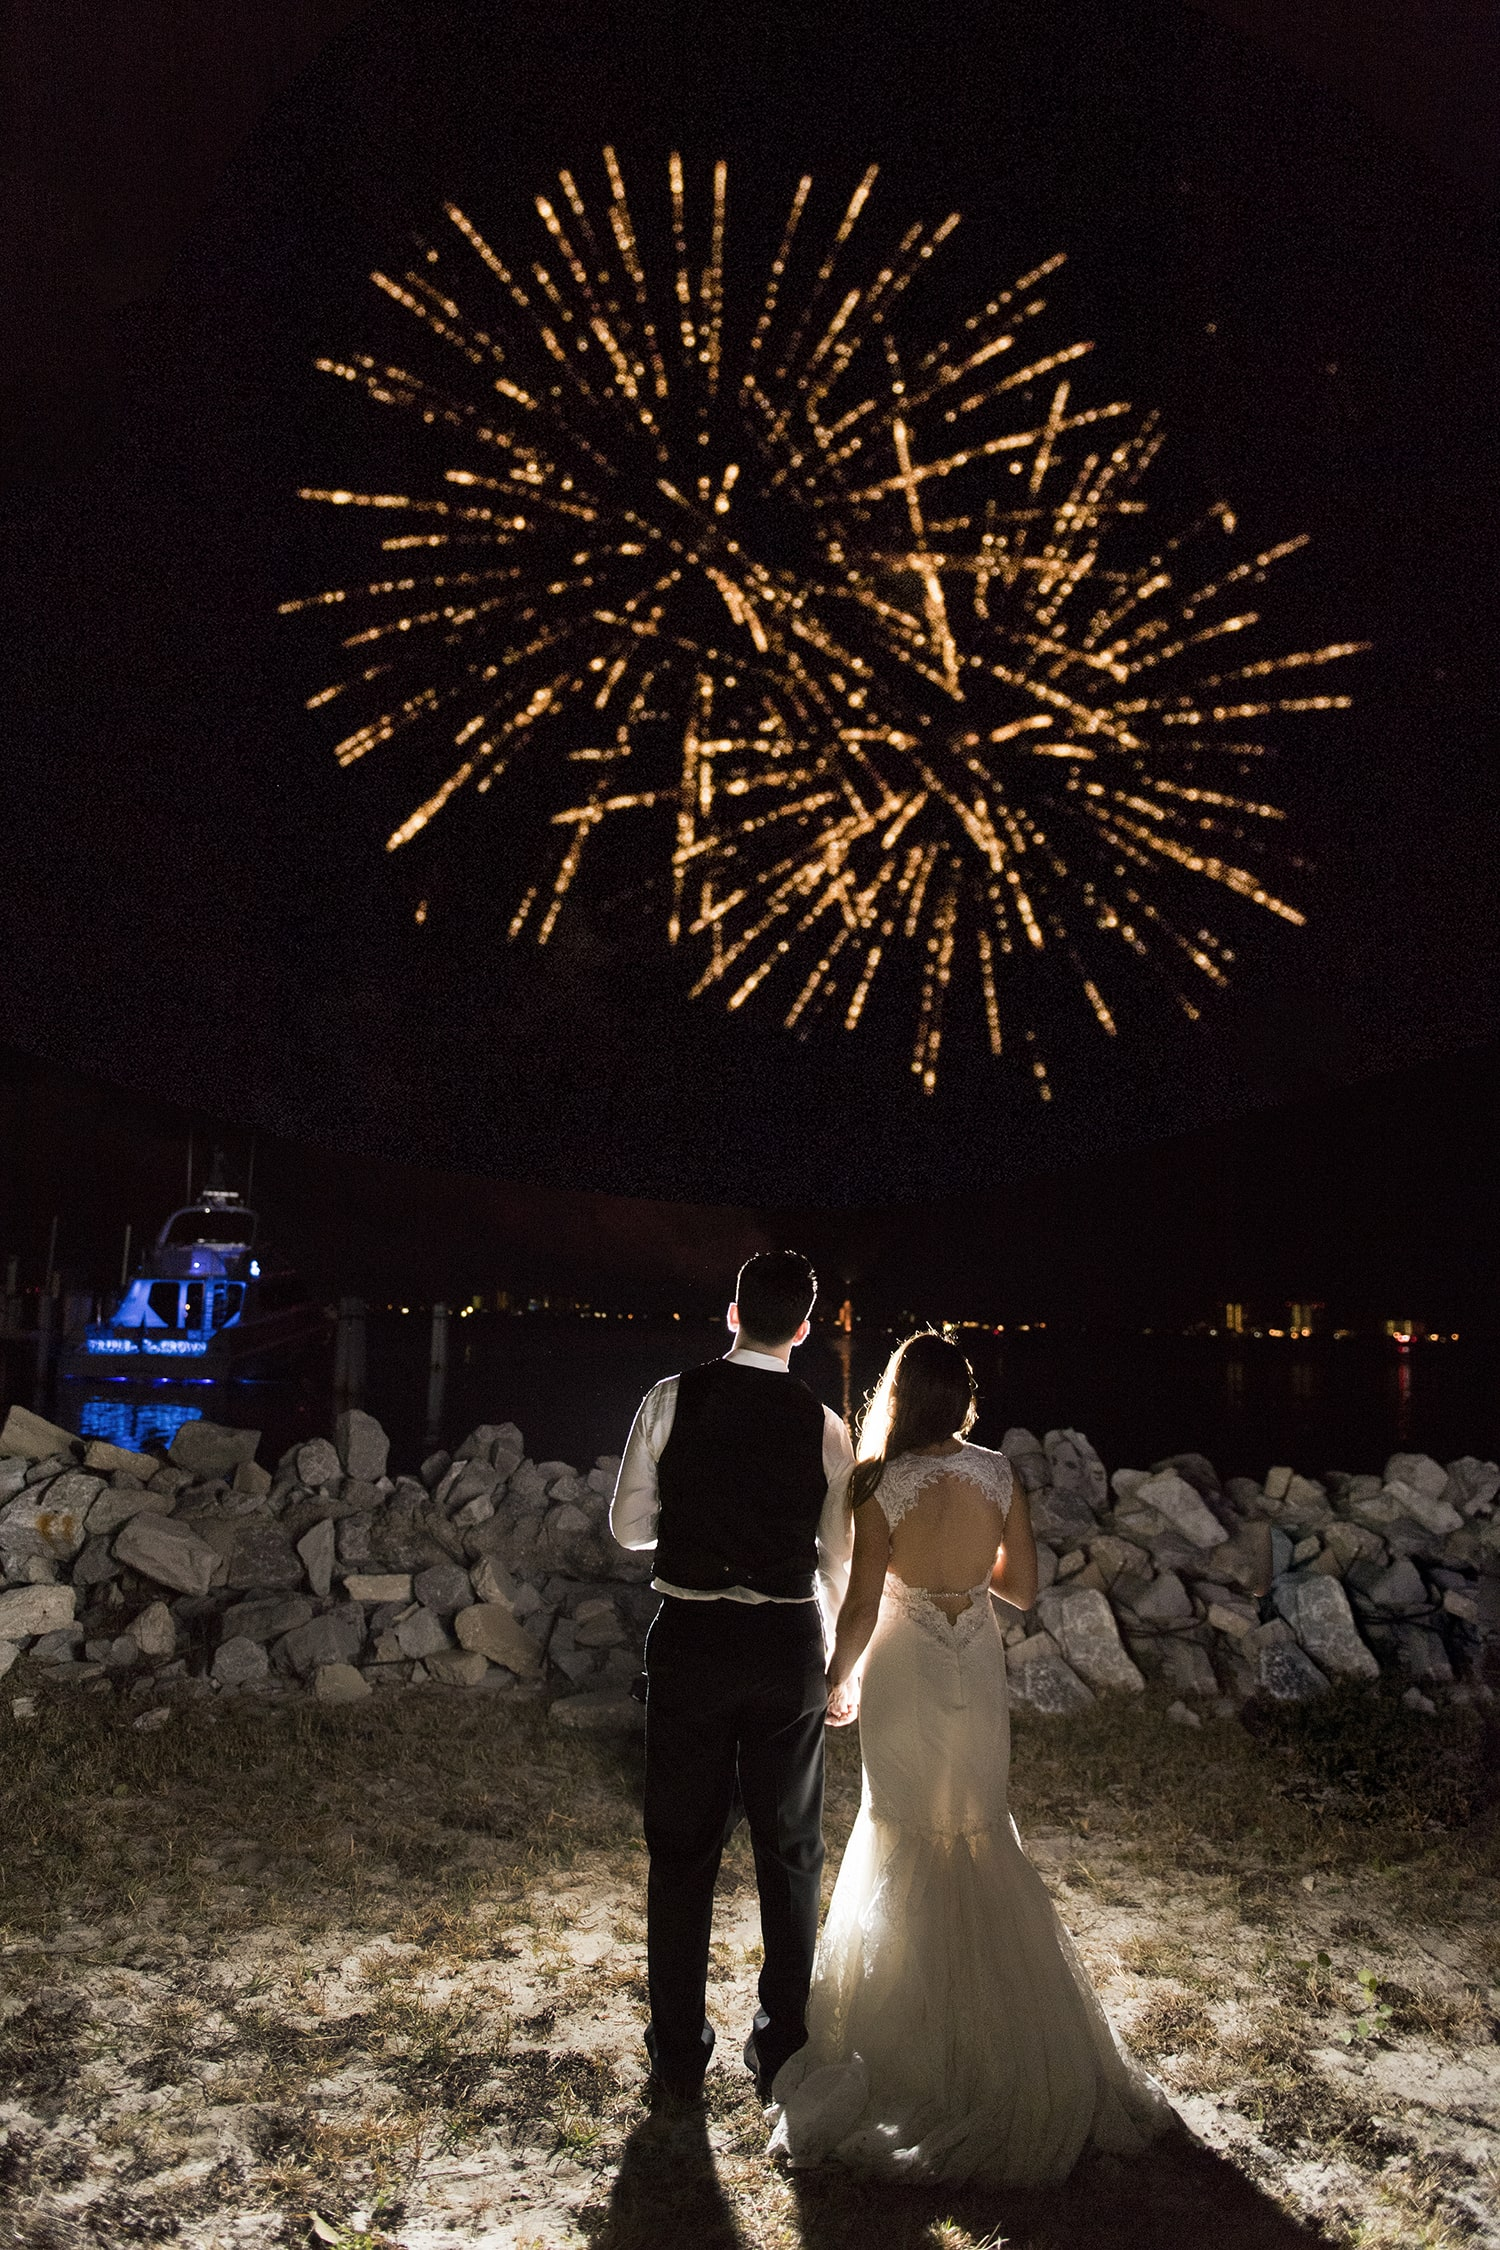 Z1+Fireworks-min.jpg